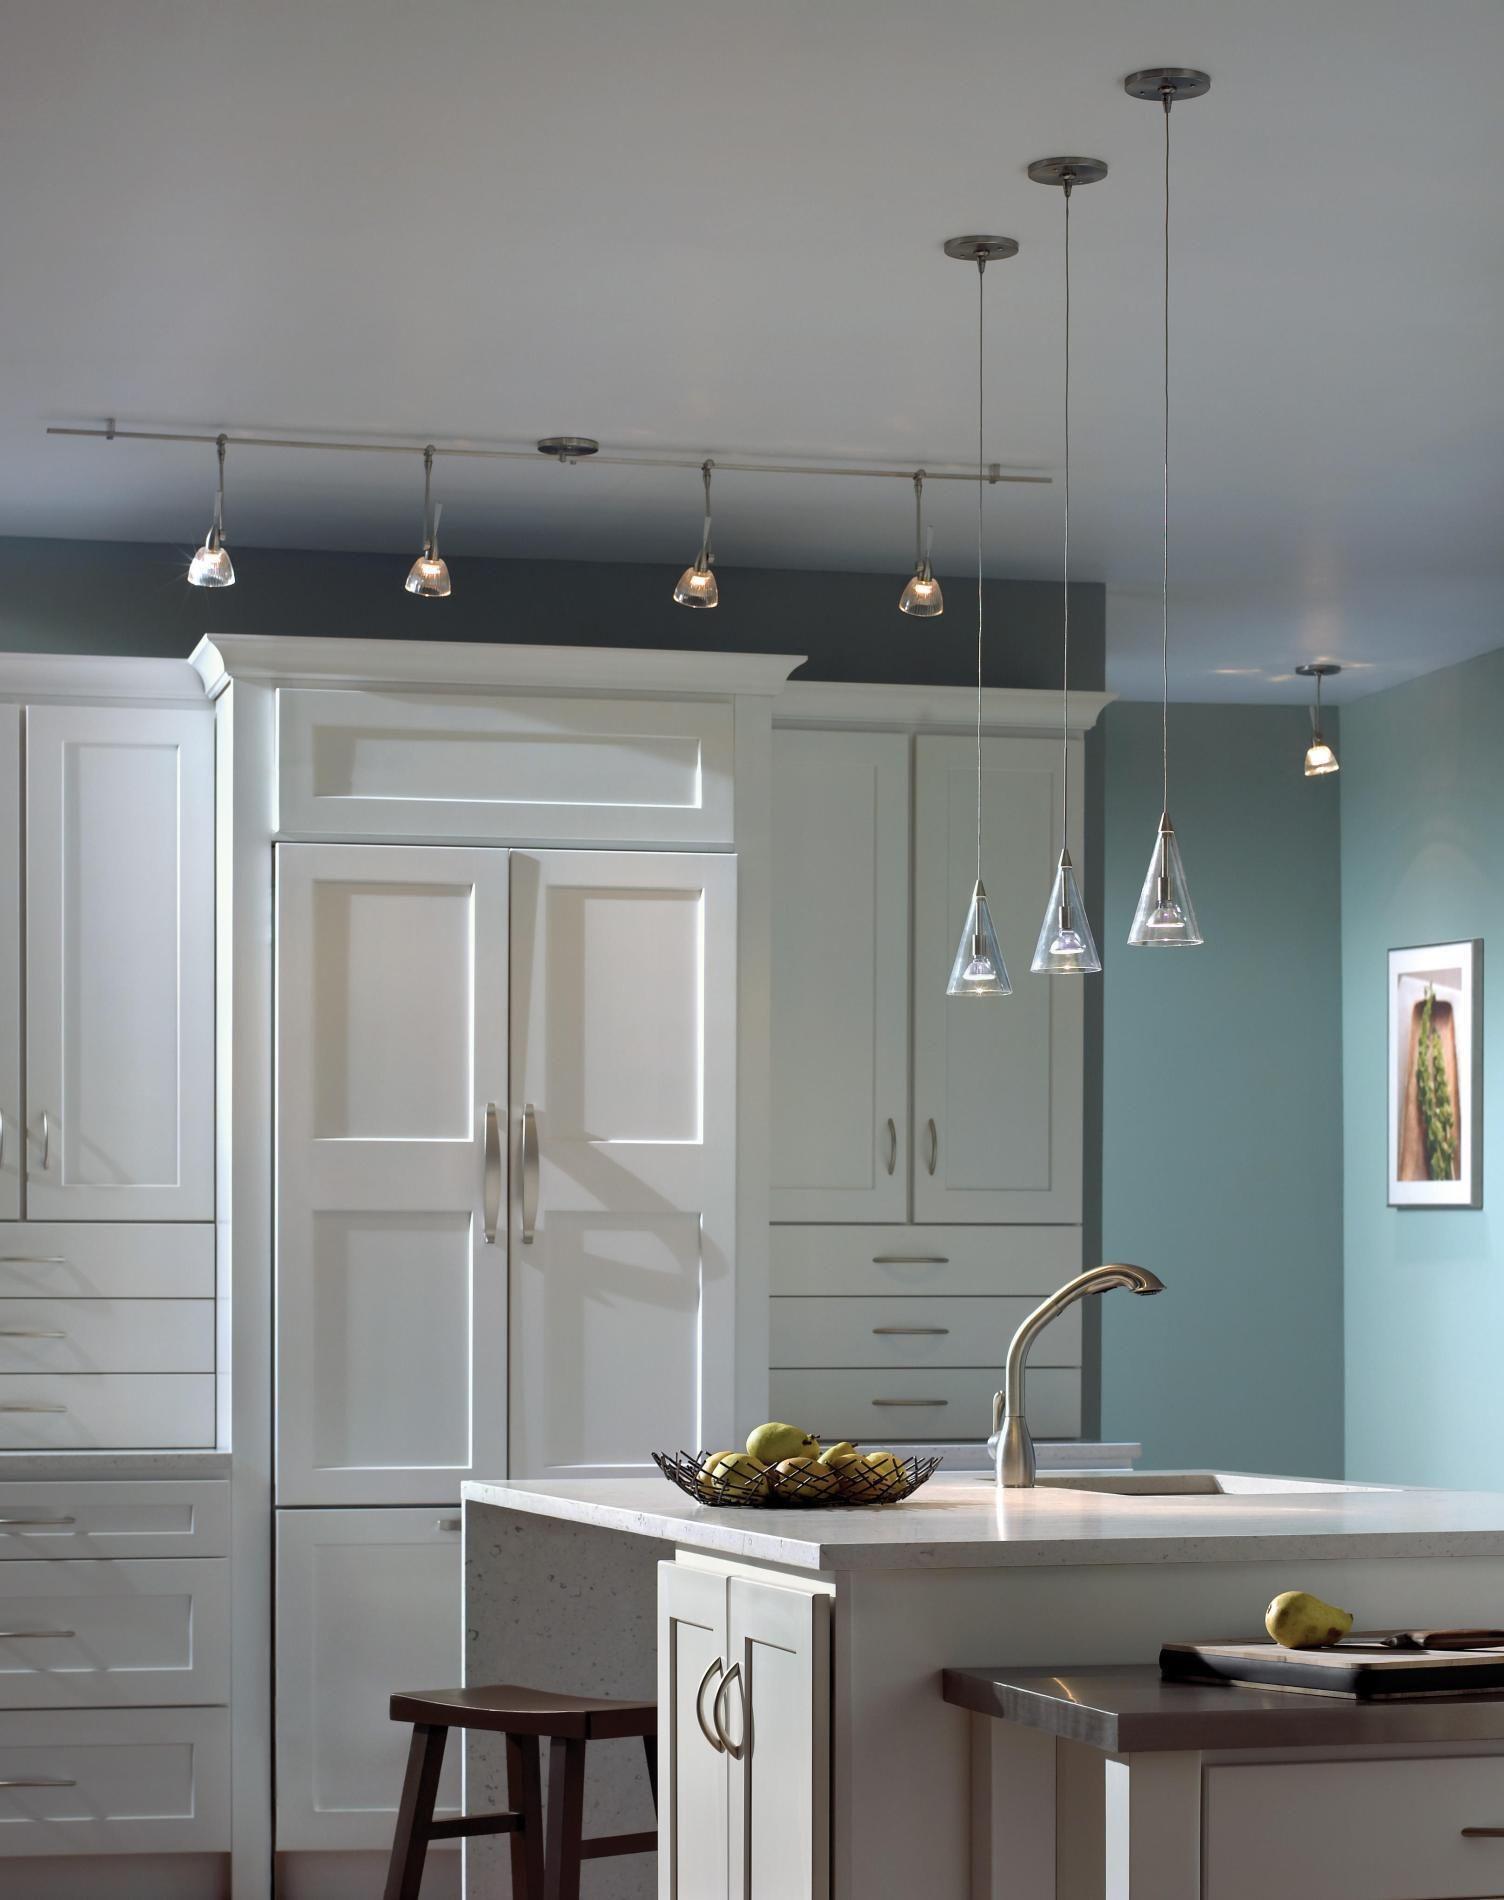 Kitchen Ceiling Ideas Vaulted And 3d Drop Ceiling In 2020 Blue Kitchen Decor Modern Kitchen Lighting Track Lighting Kitchen